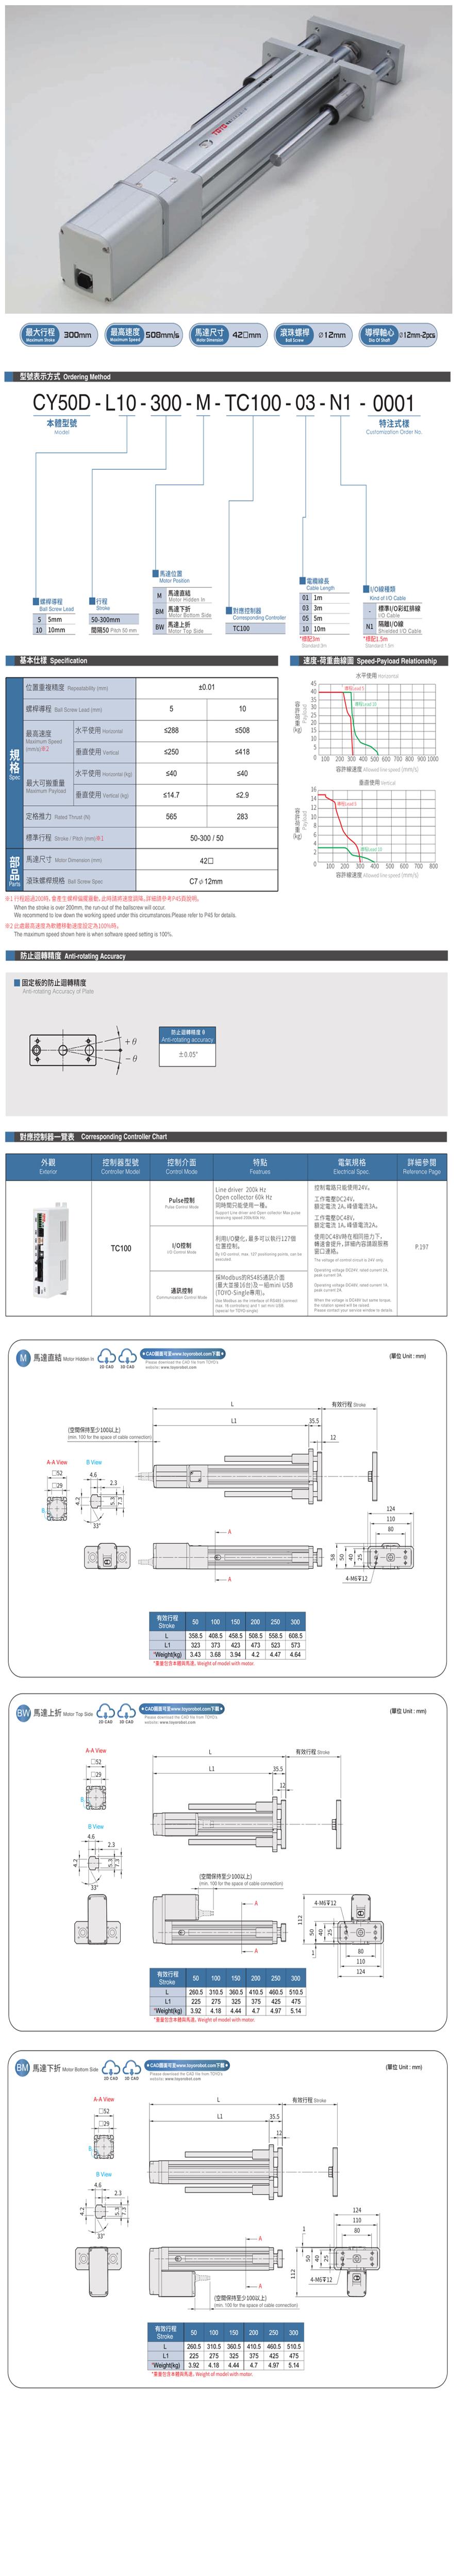 TOYO伺服电动缸CY50D